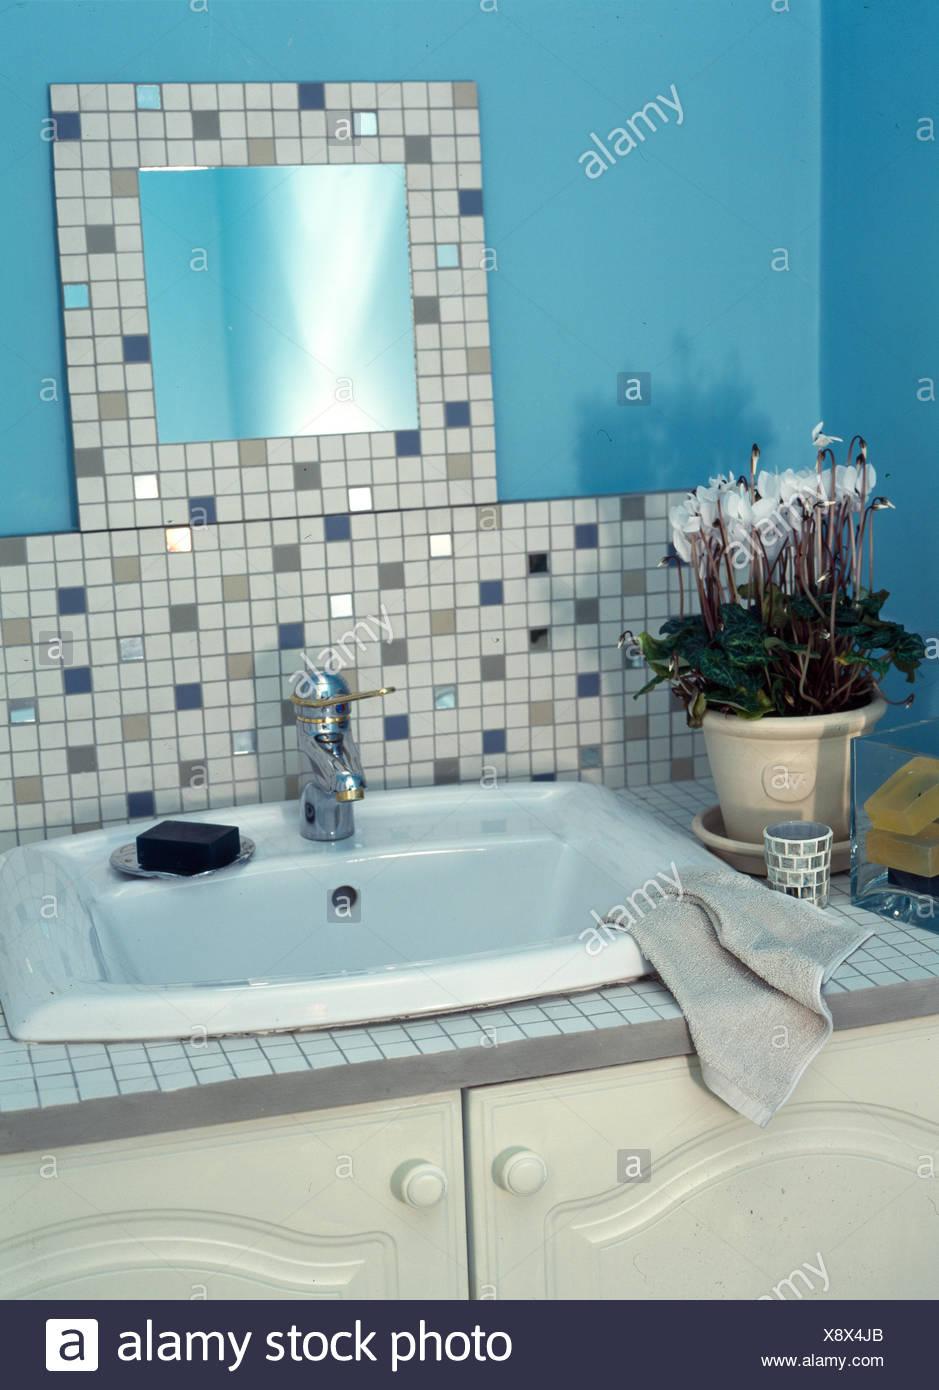 Tiling Bathroom Stock Photos & Tiling Bathroom Stock Images - Alamy